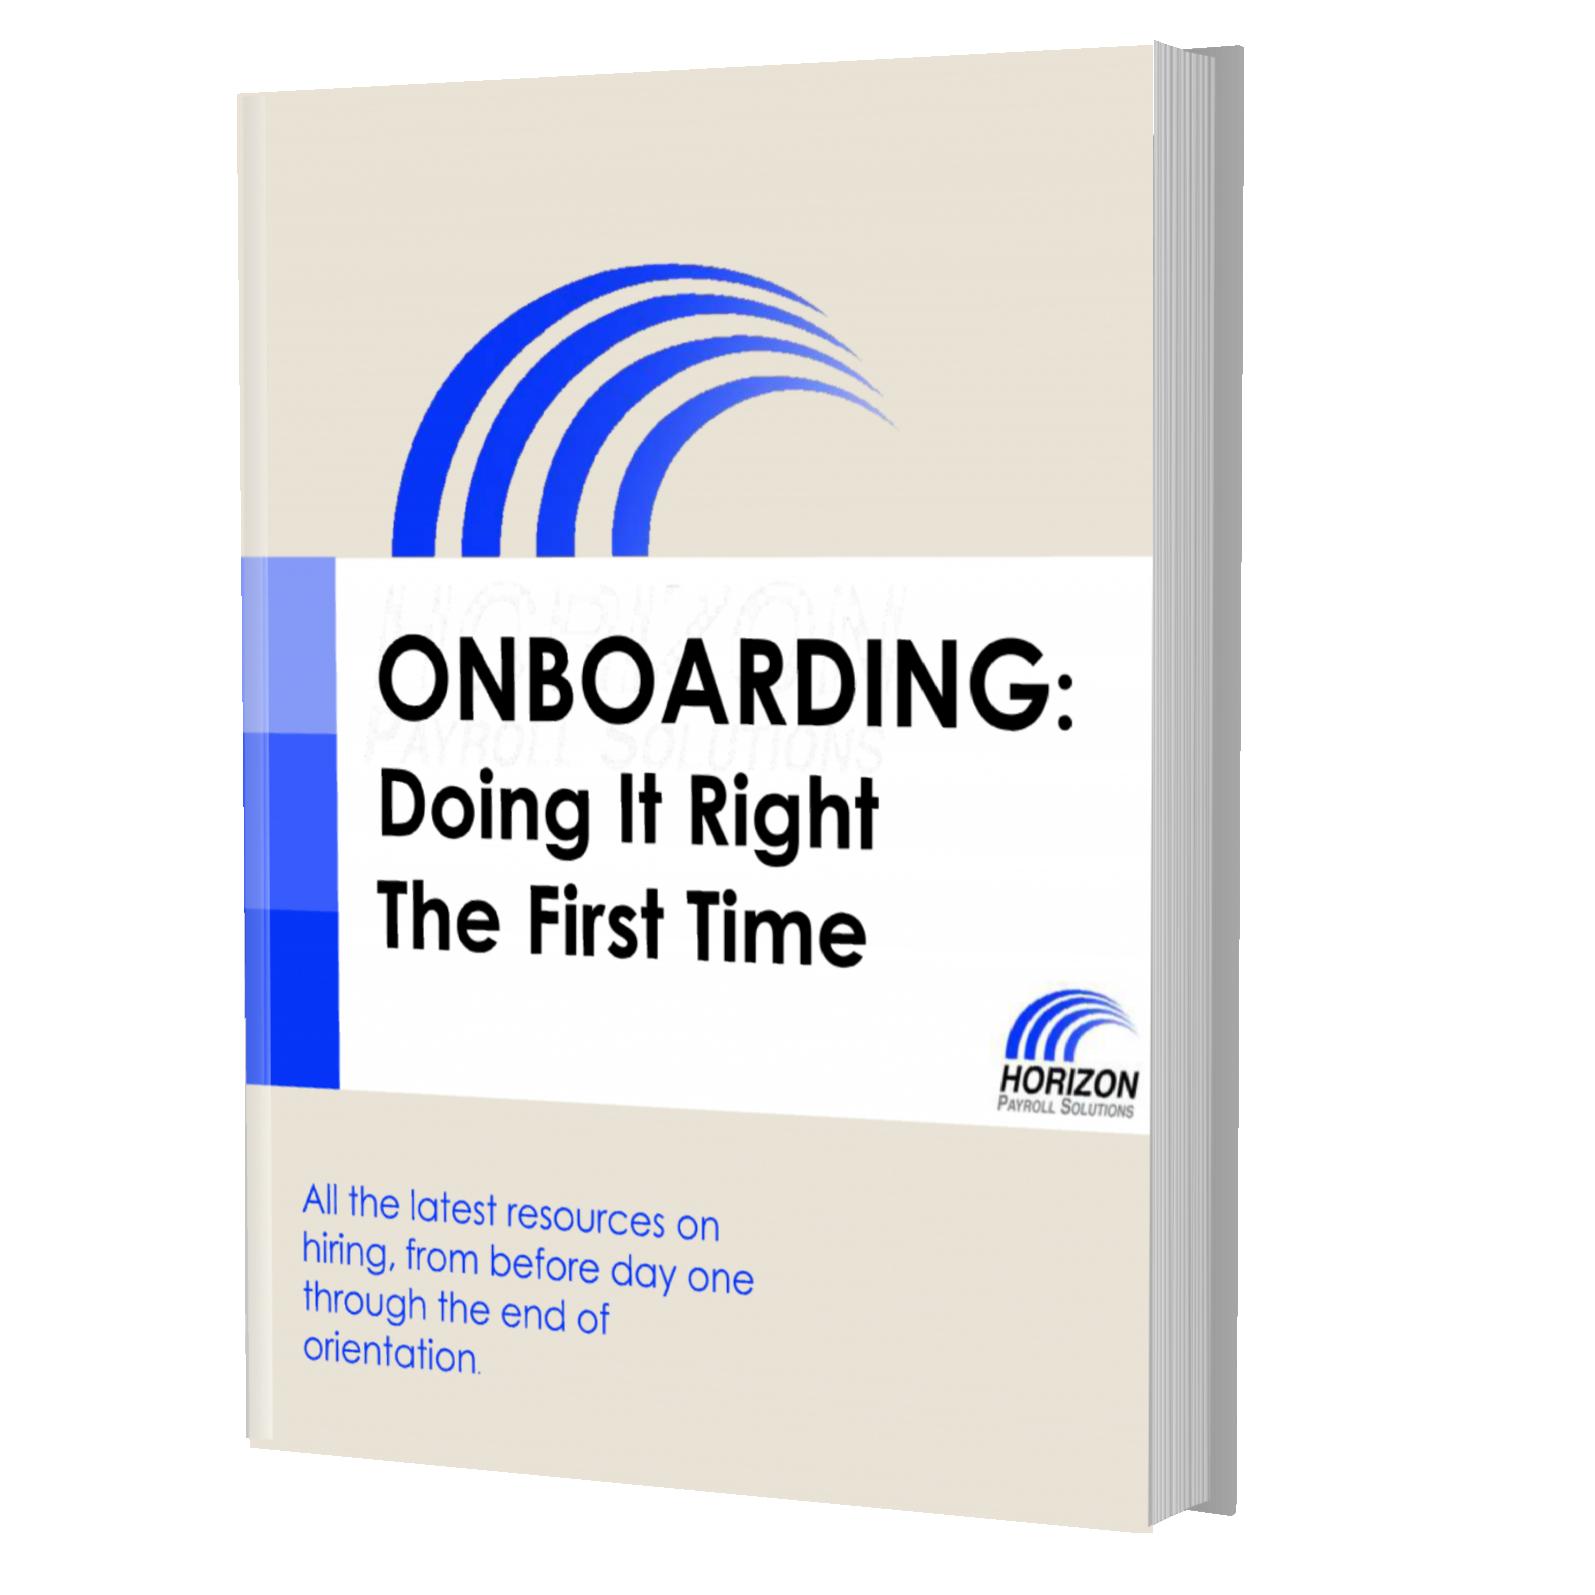 Onboarding by Horizon Payroll R1jm-1.png